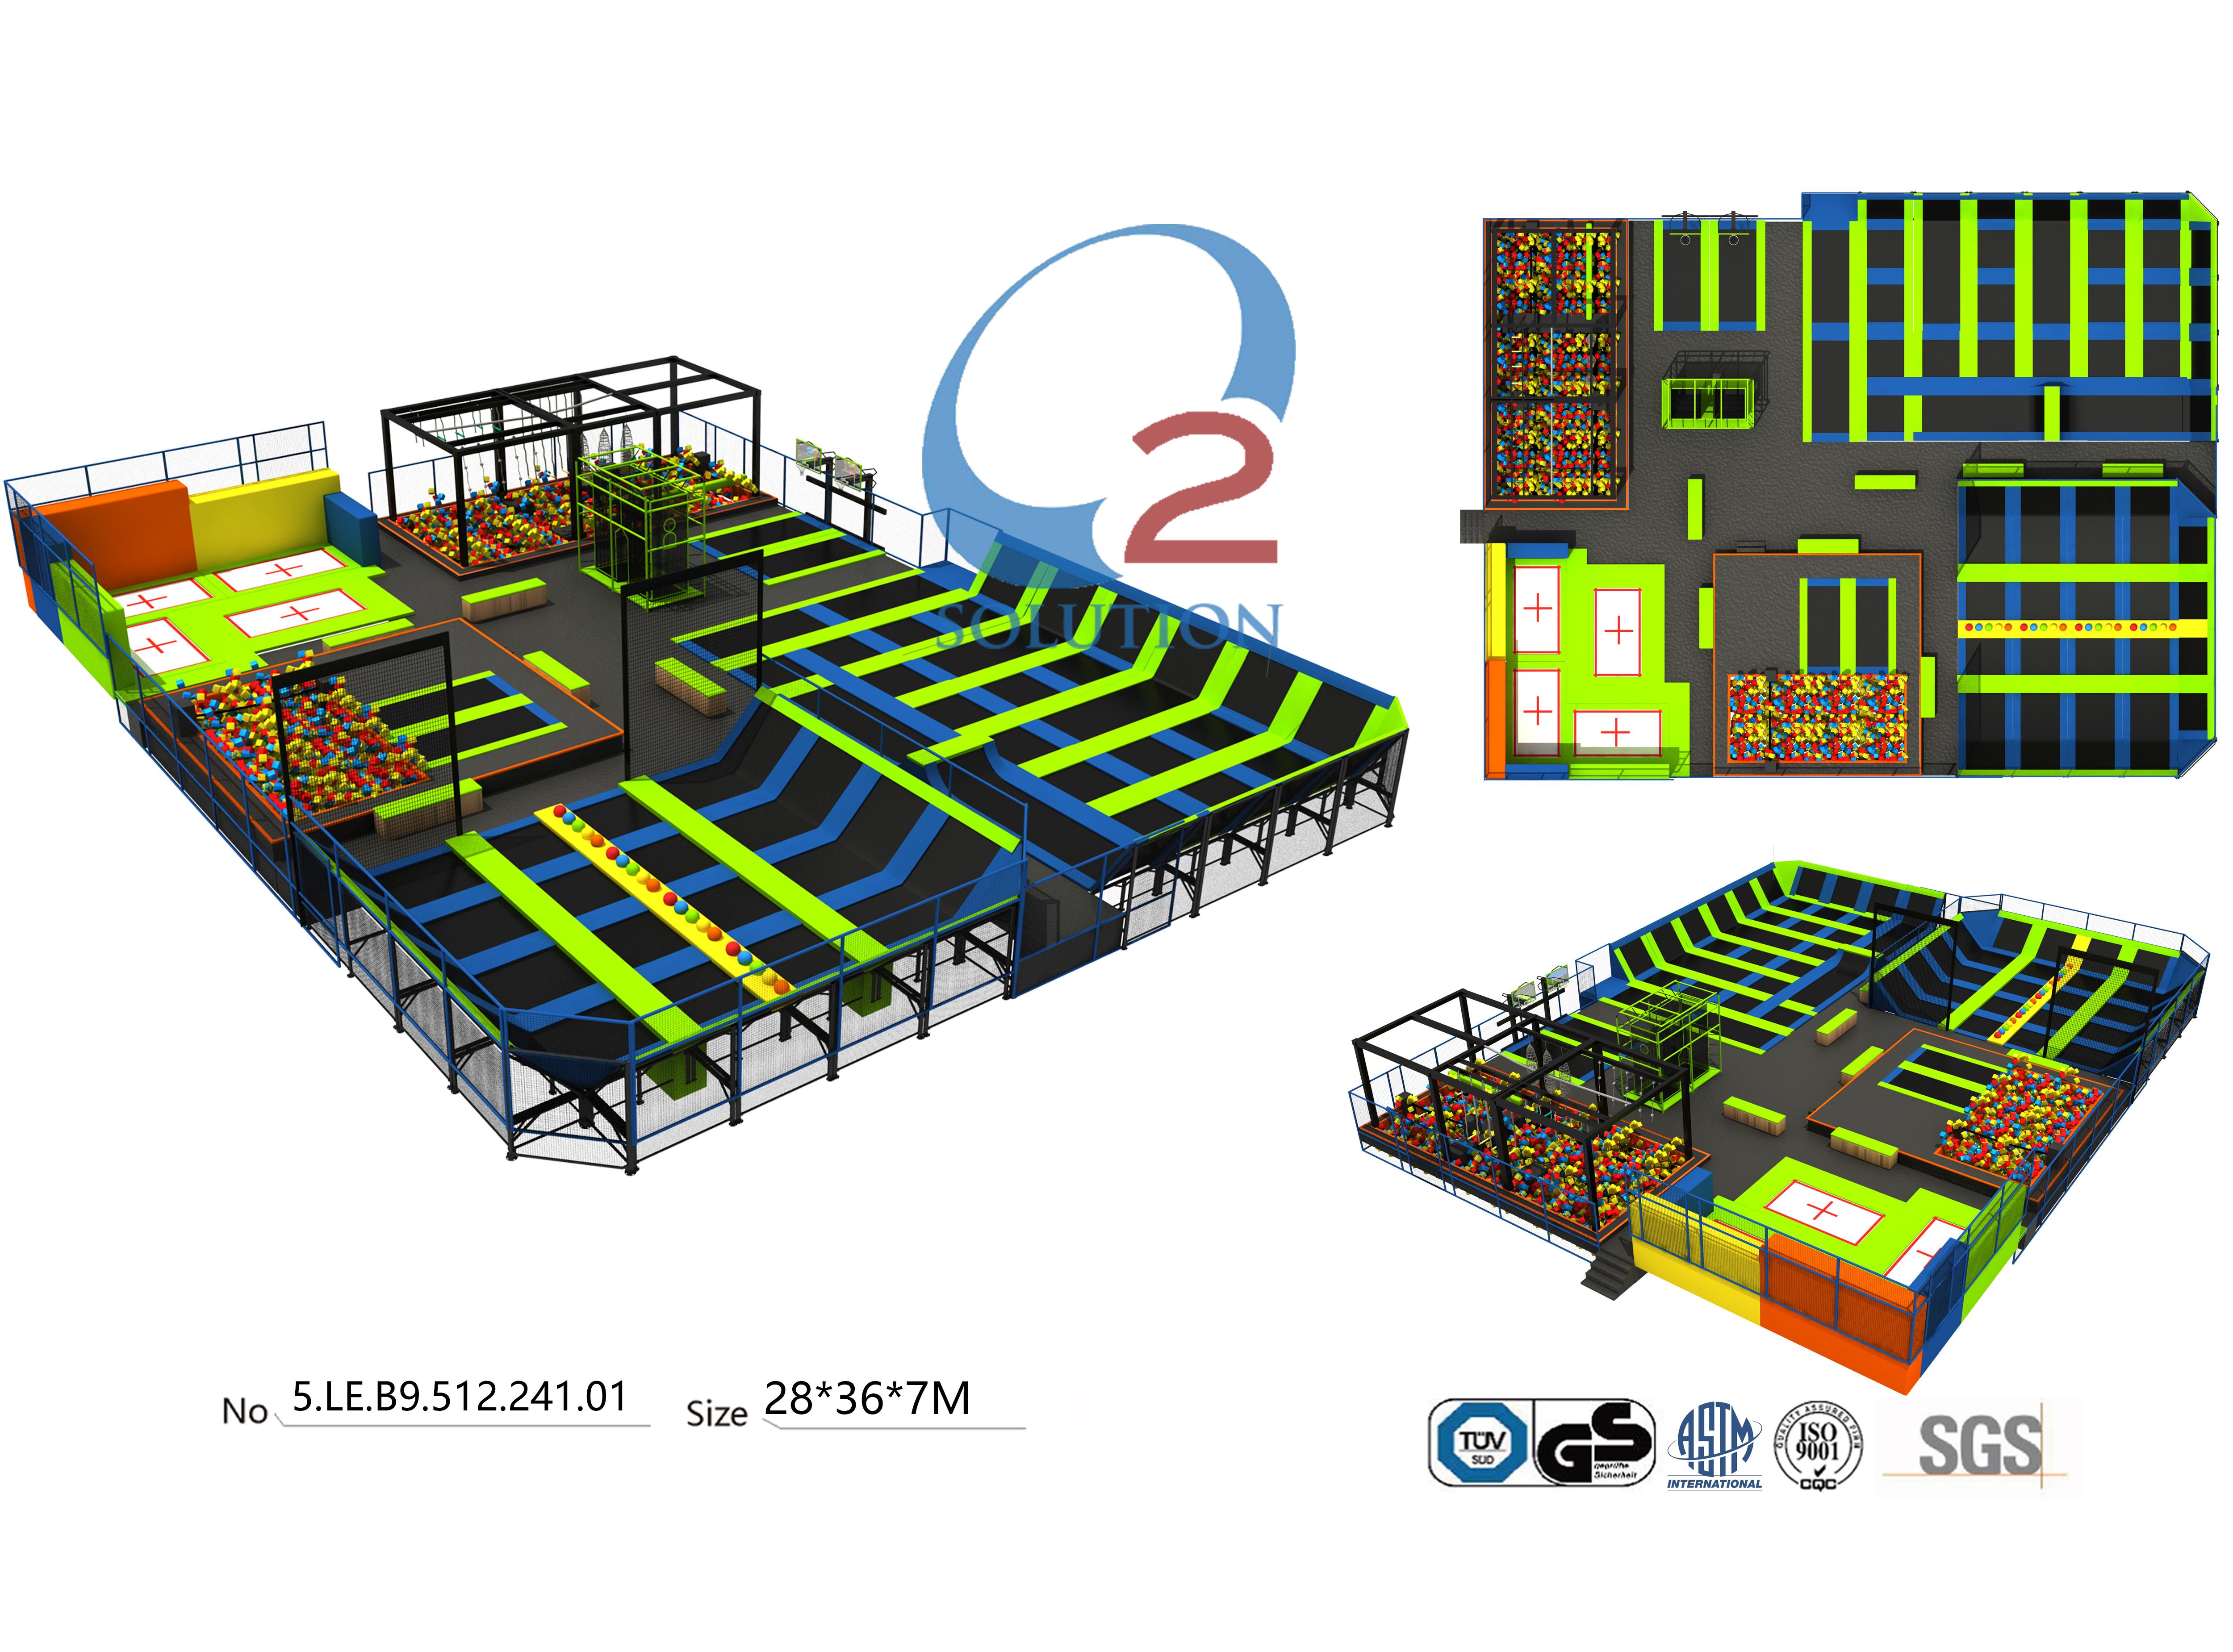 prix d un trampoline trampoline diam 3 66 m filet de s curit chelle trampoli. Black Bedroom Furniture Sets. Home Design Ideas